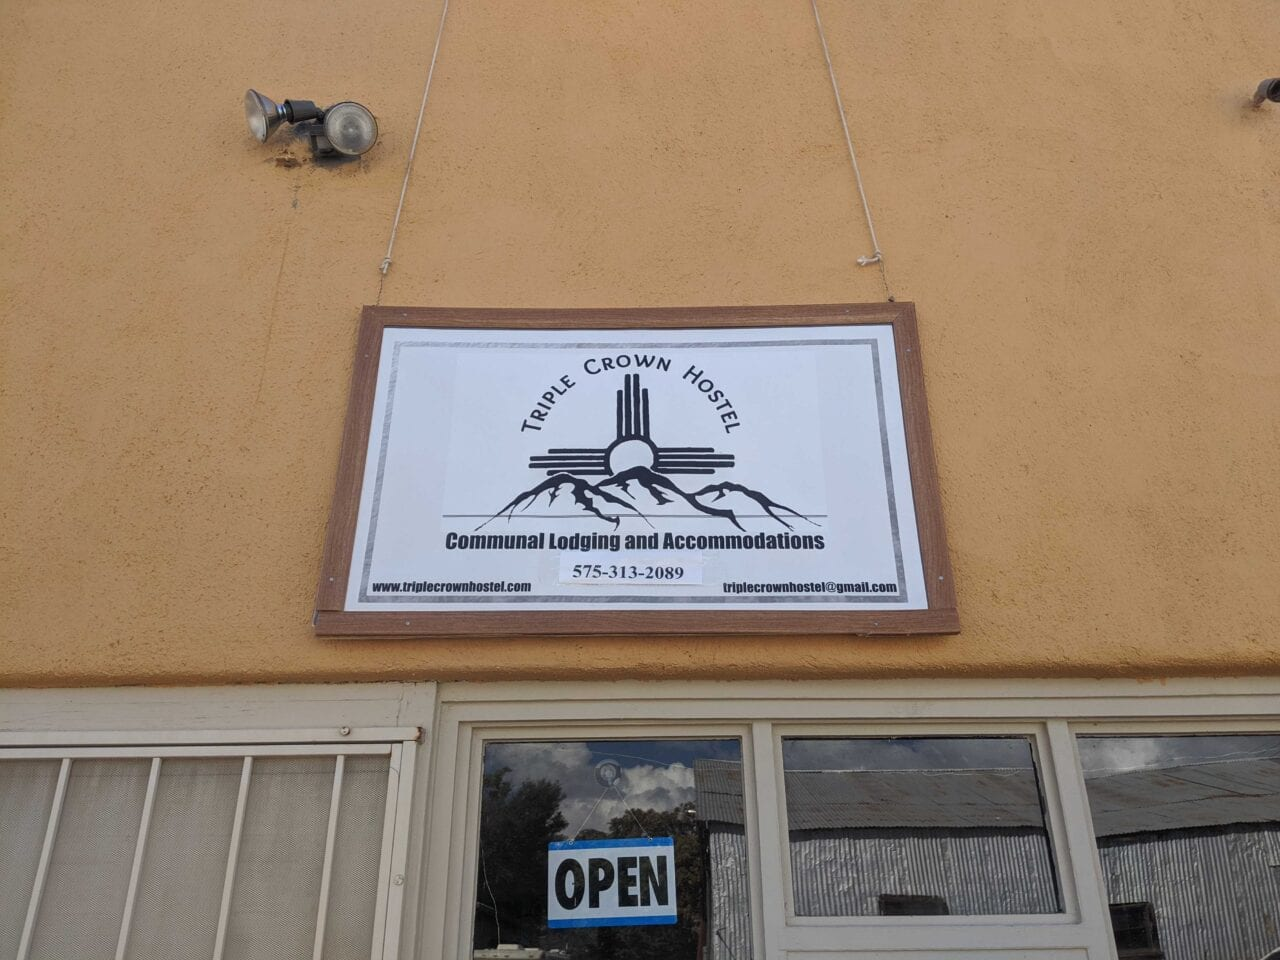 Triple Crown Hostel sign